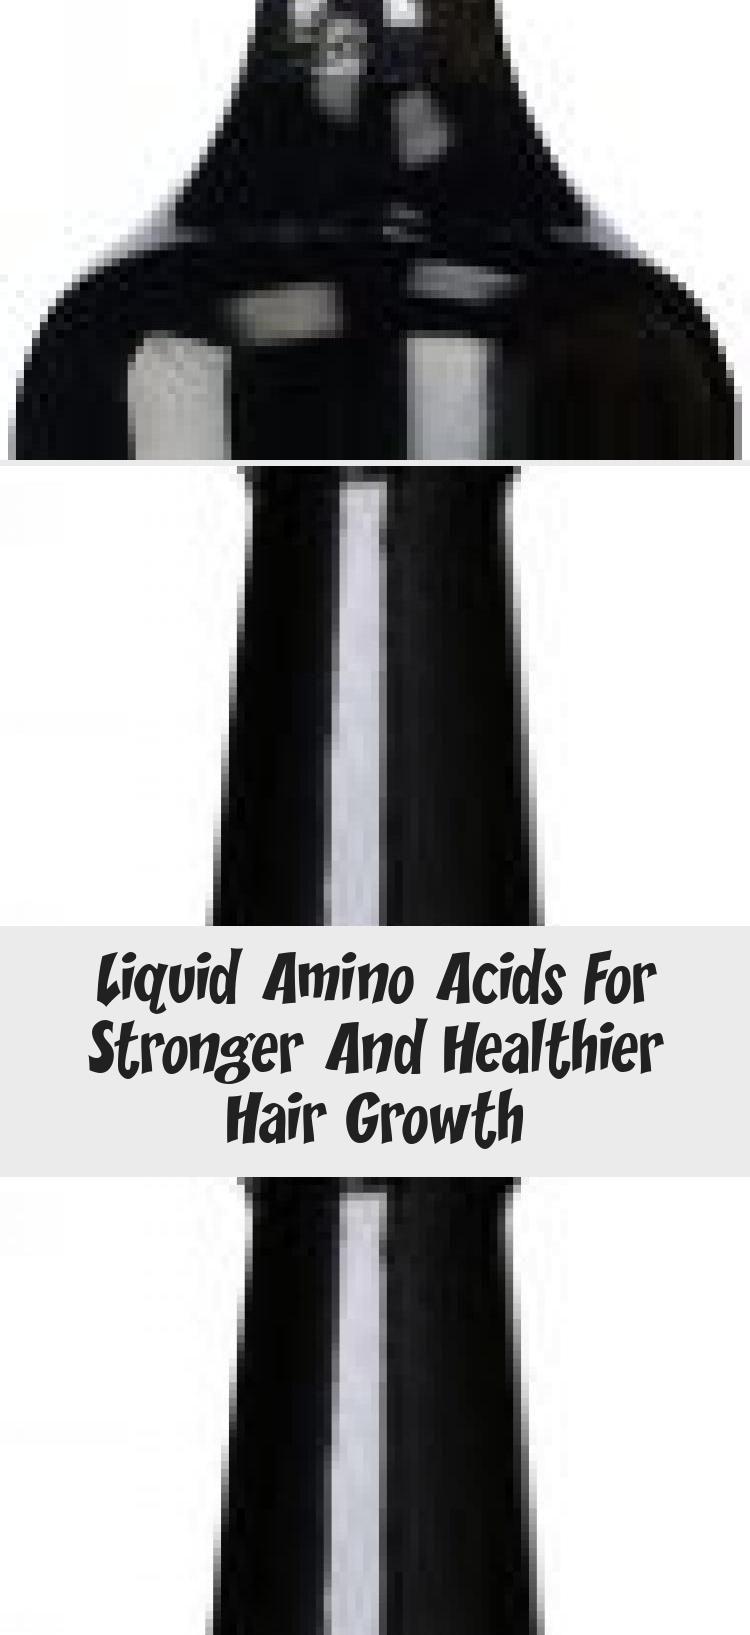 Supplement for Hair Growth} and How to Use Liquid Amino Acids for Stronger & Healthier Hair Growth. #hair #haircare #naturalhair #teamnatural #protein #moisture #stronghair #naturalhaircommunity #liquidaminos #DIY #DIYrecipes #beauty #grooming #Biotinhairgrowth #Stimulatehairgrowth #CastorOilhairgrowth #hairgrowthSerum #hairgrowthPills